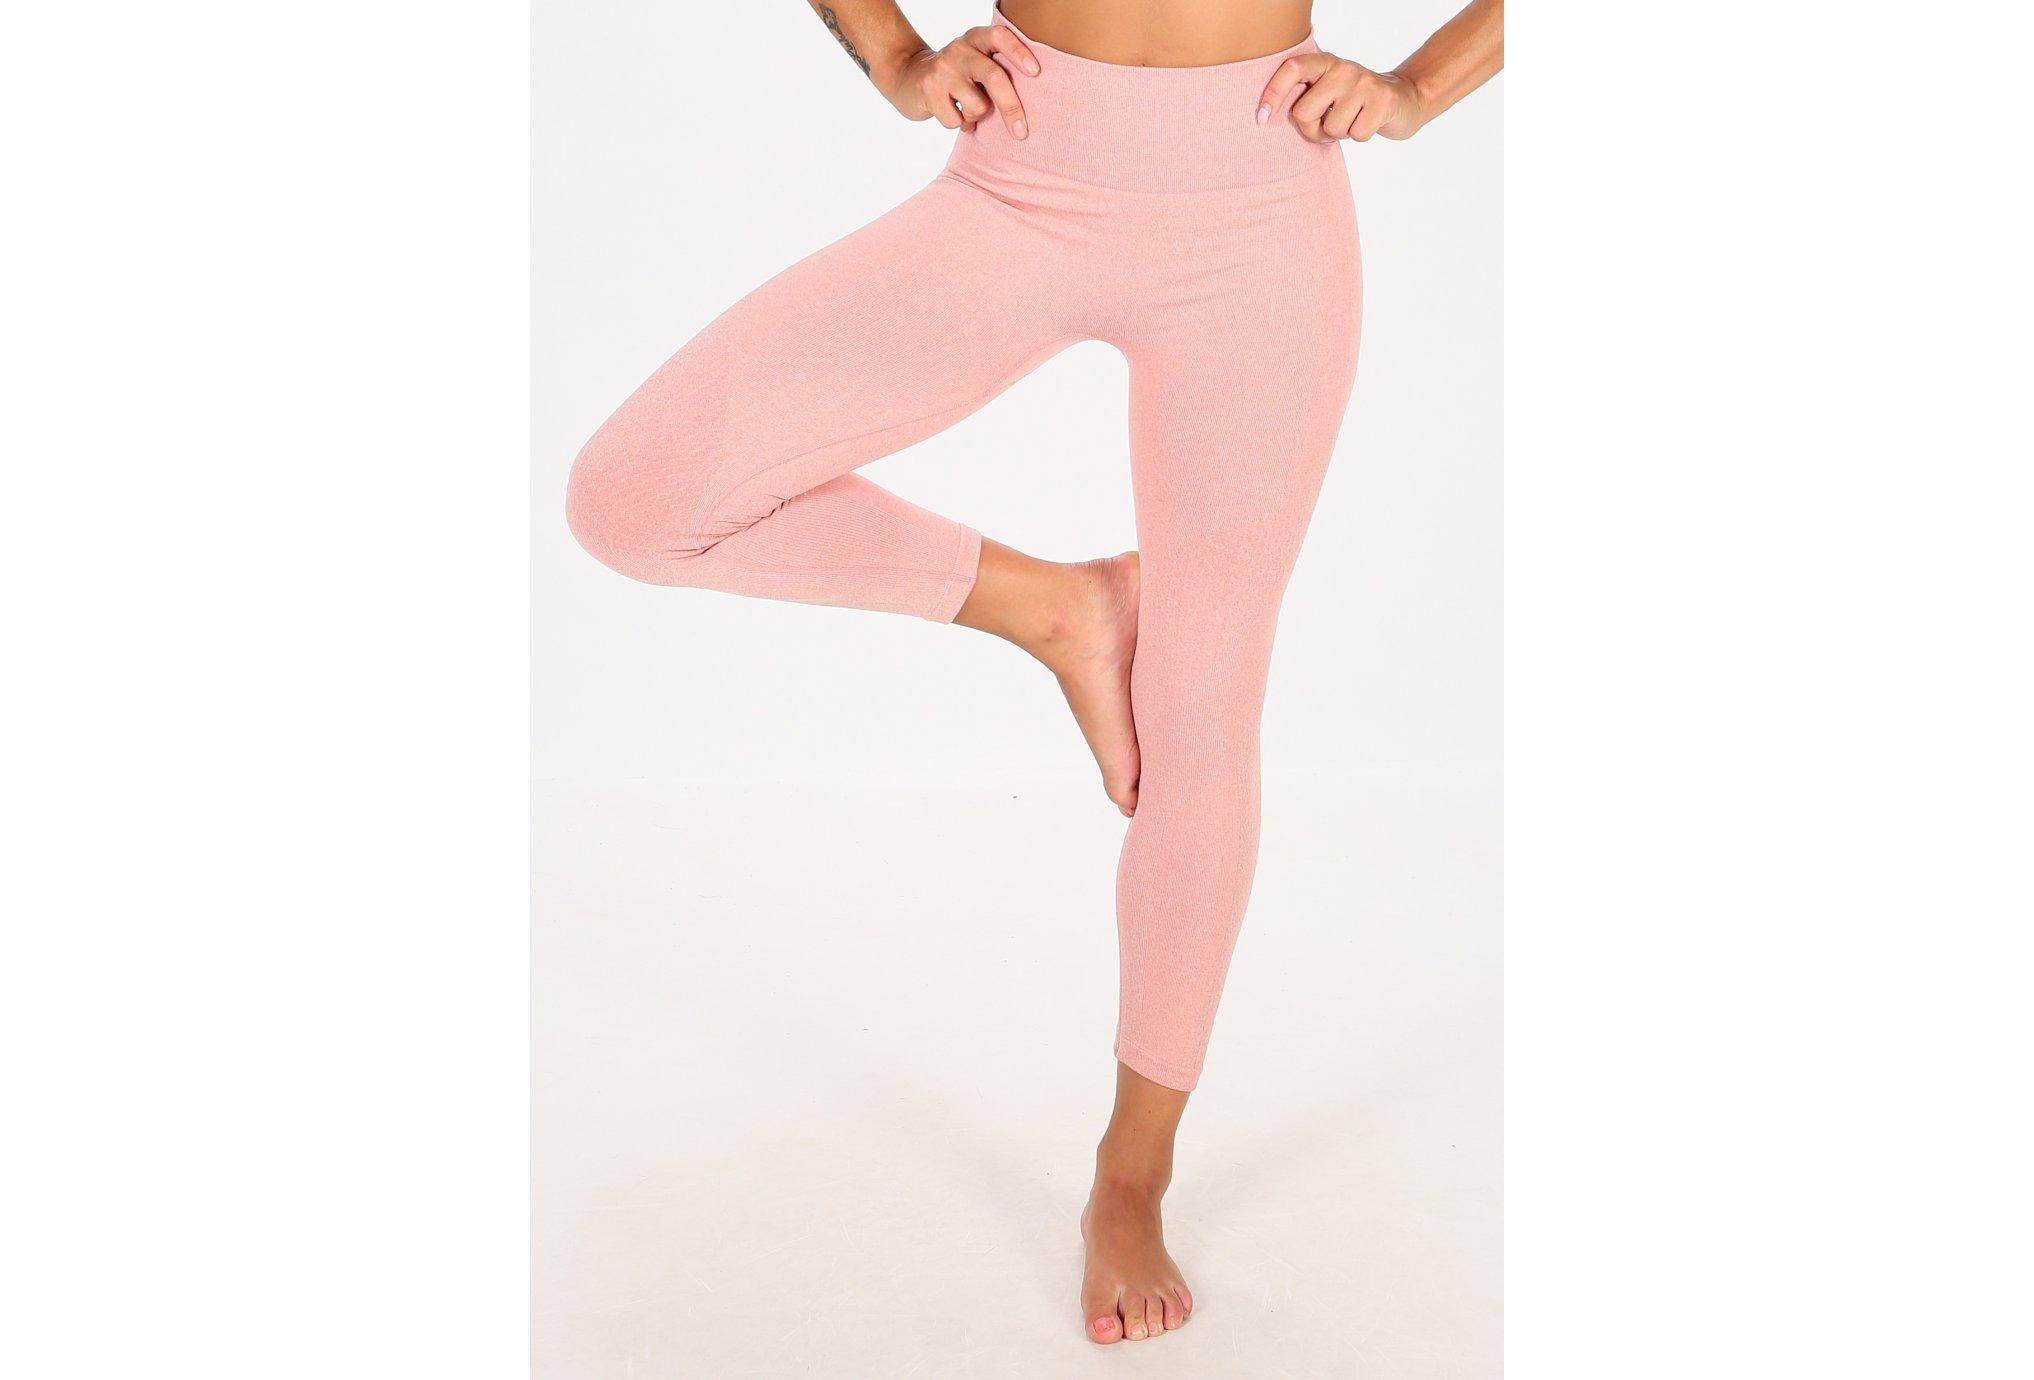 Nike Yoga Seamless W Diététique Vêtements femme